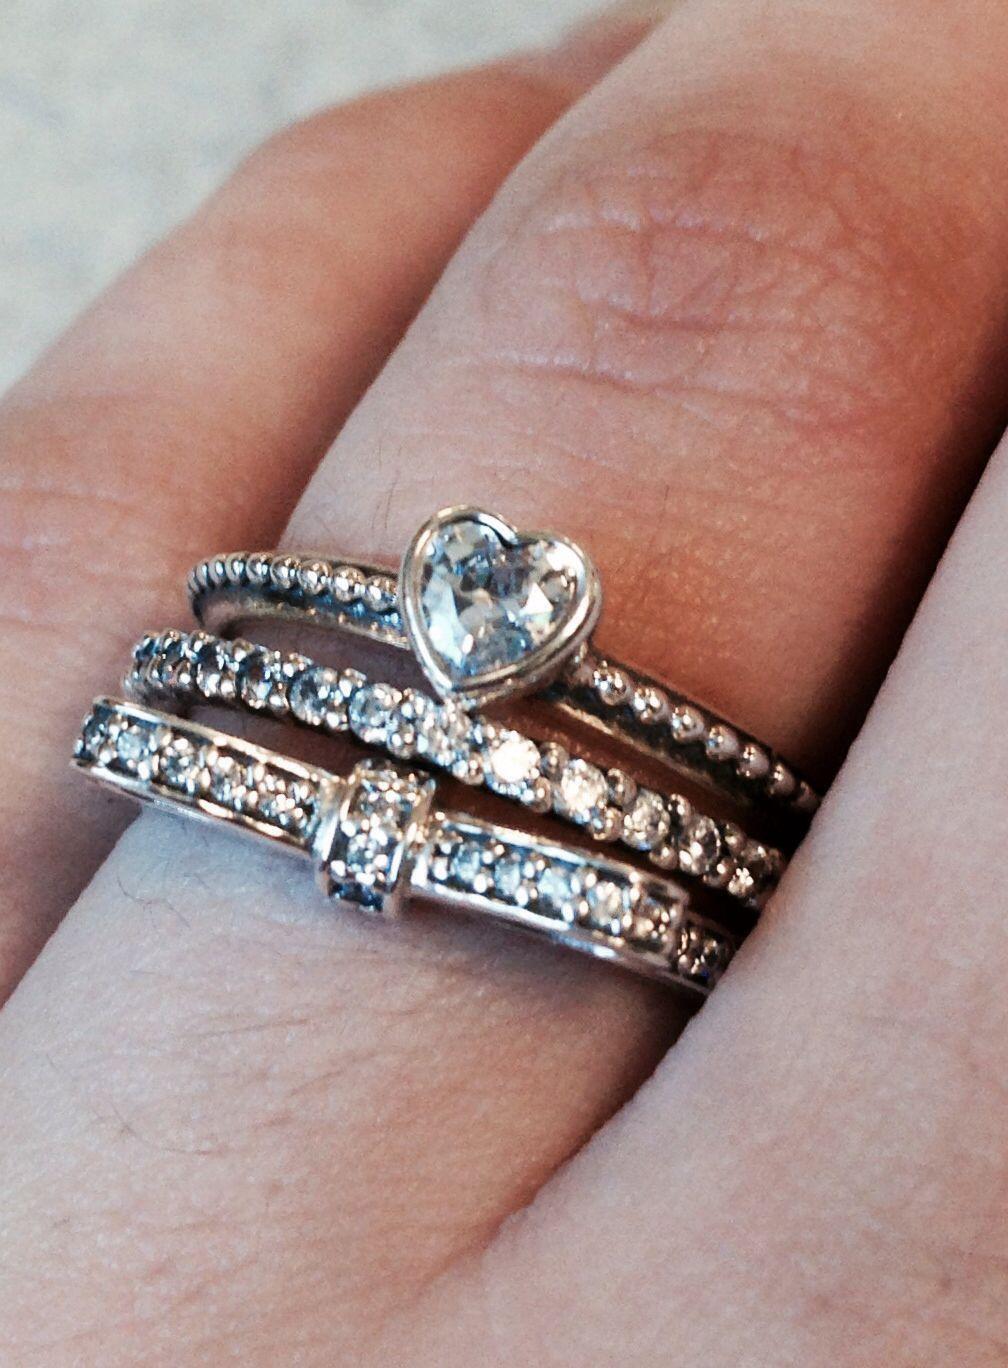 The promise rings my boyfriend got me.